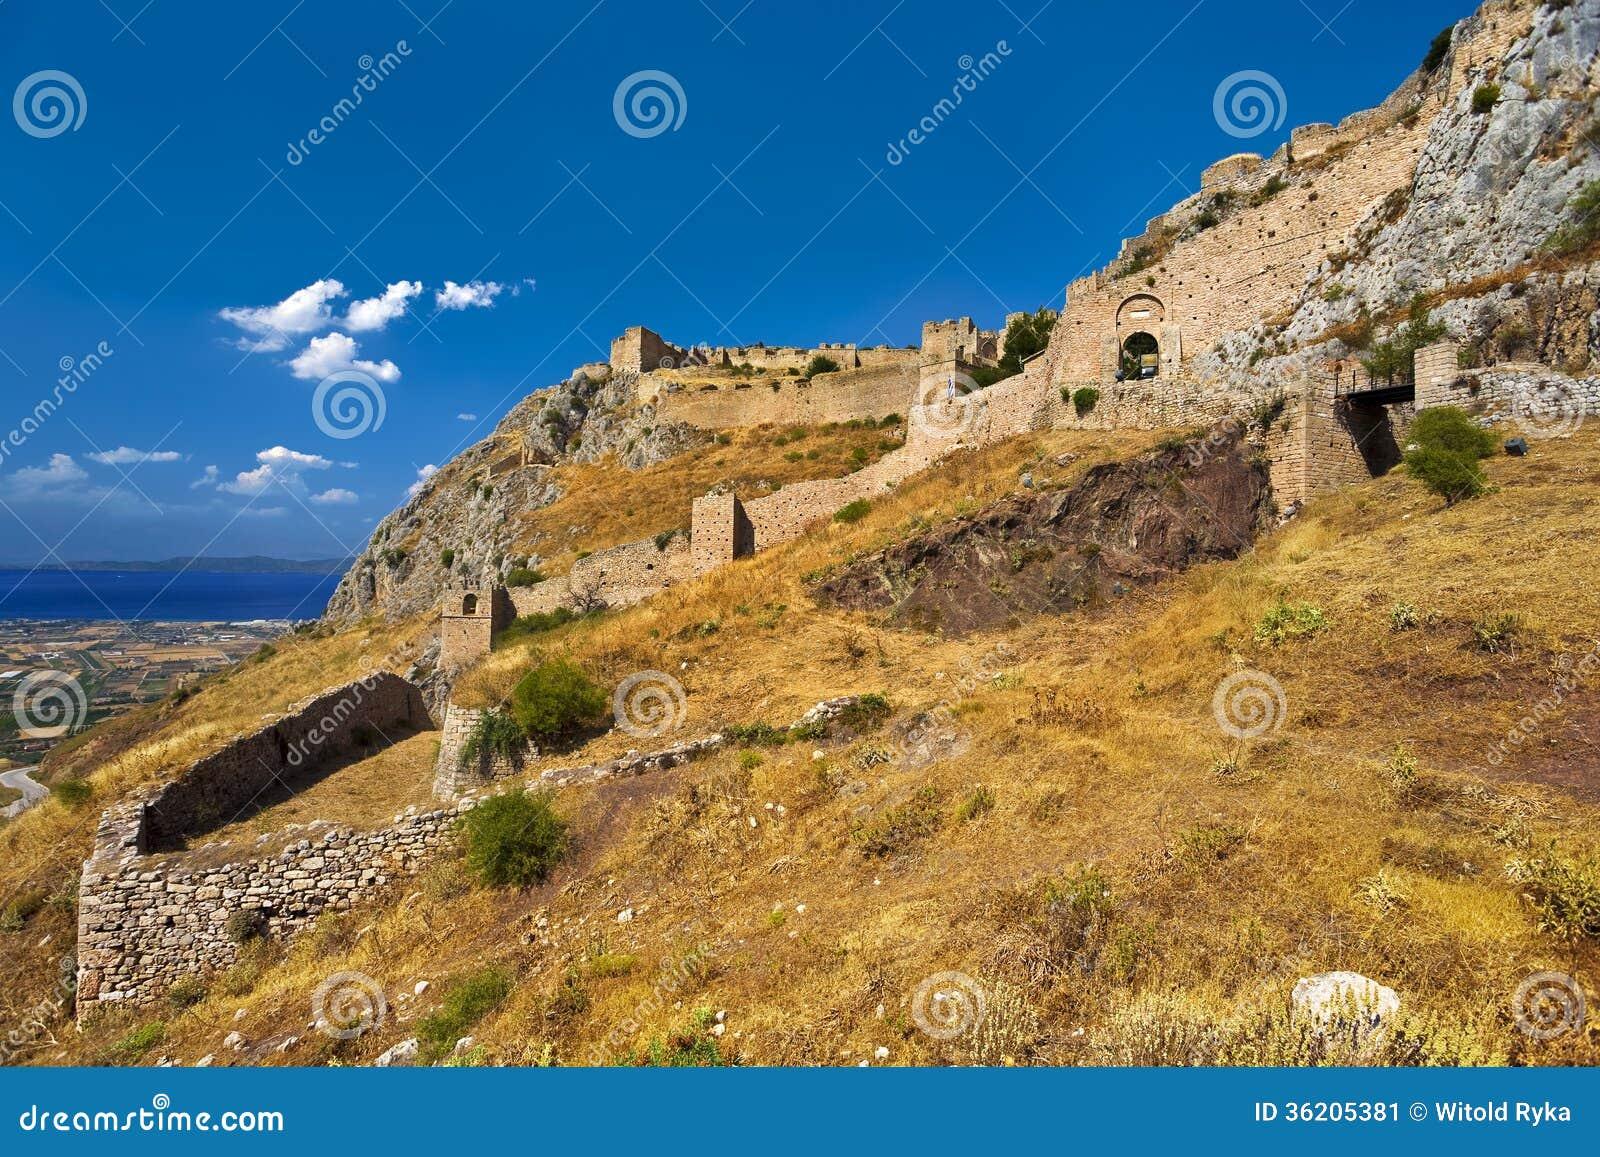 Acrocorinth, Greece Stock Image - Image: 36205381